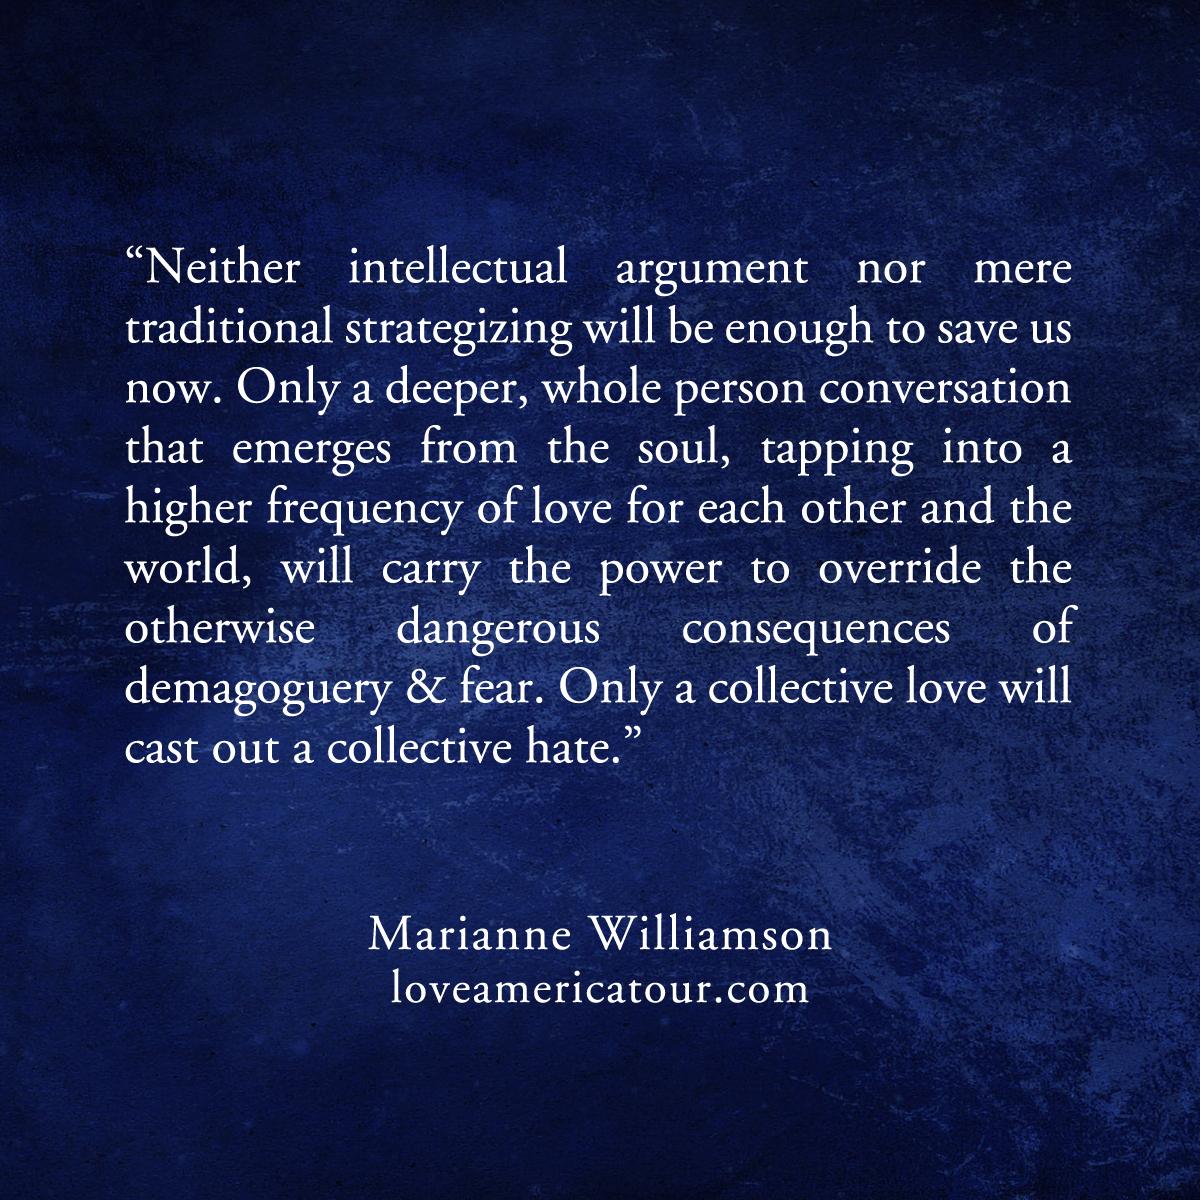 Marianne williamson poems